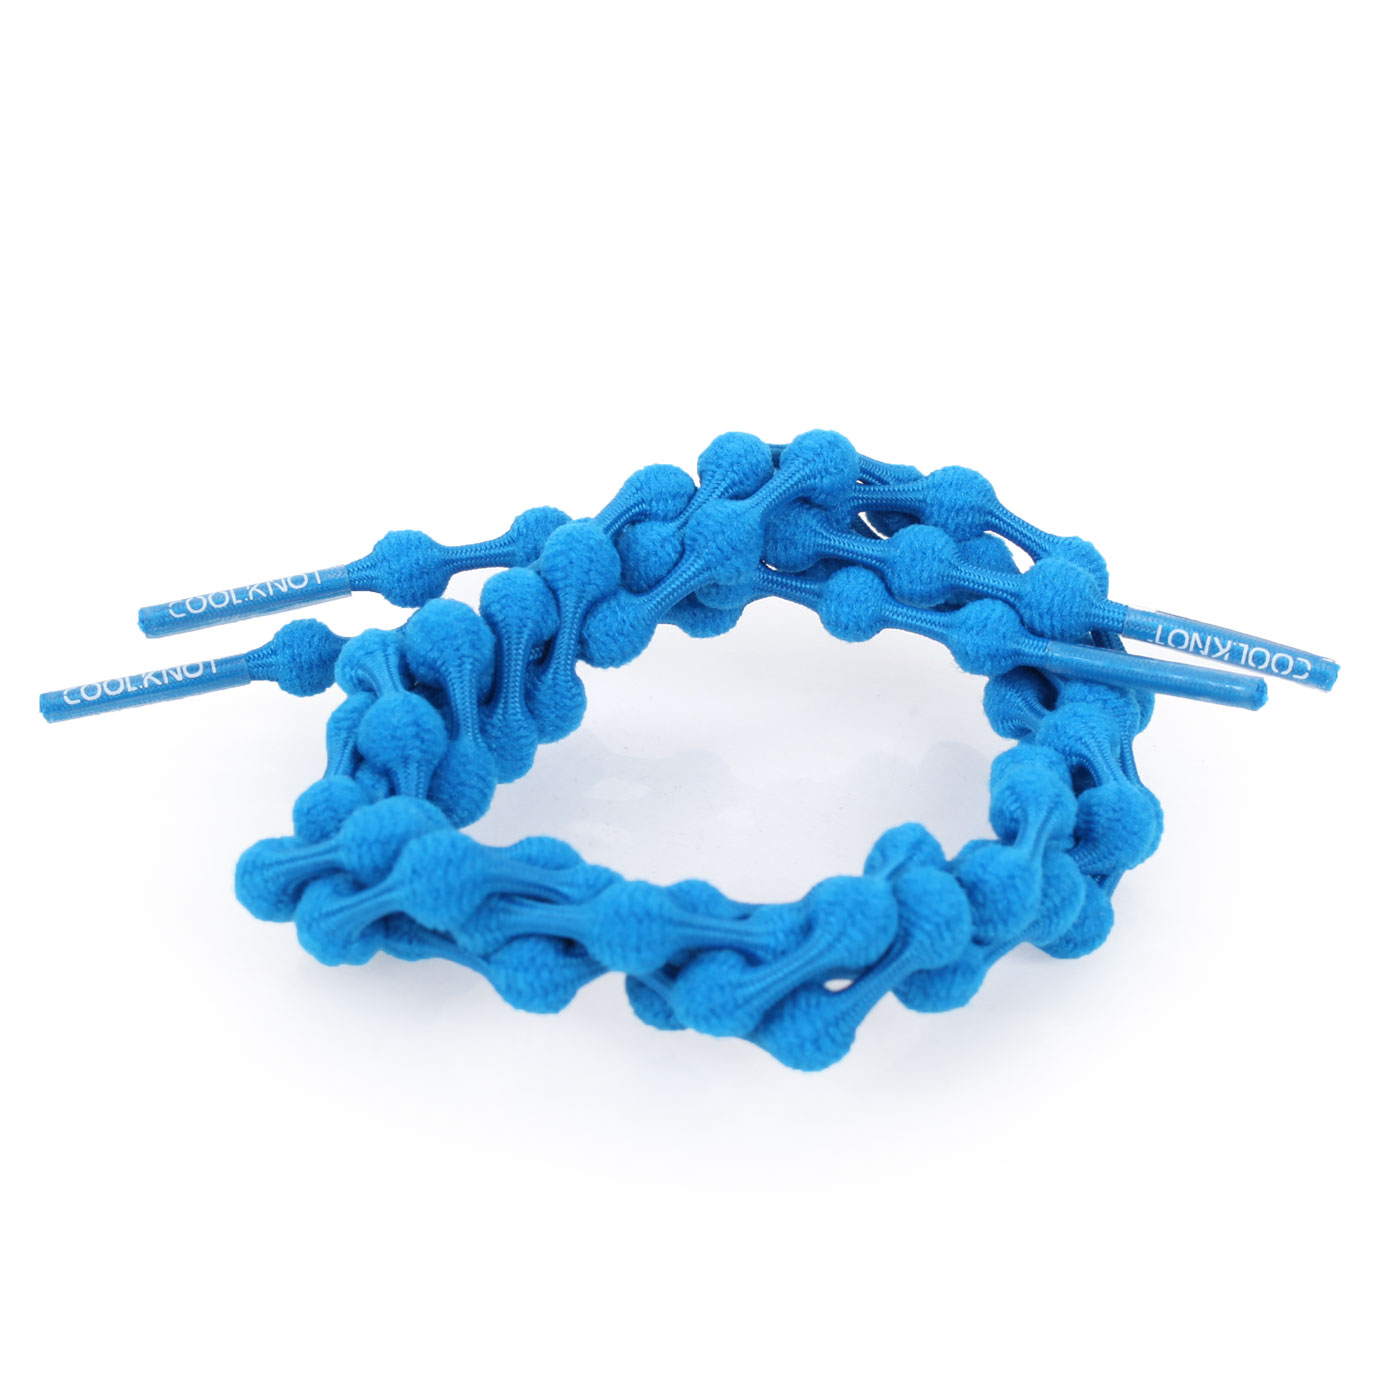 COOLKNOT 豆豆鞋帶(舒適款)60CM 6026201 - 藍